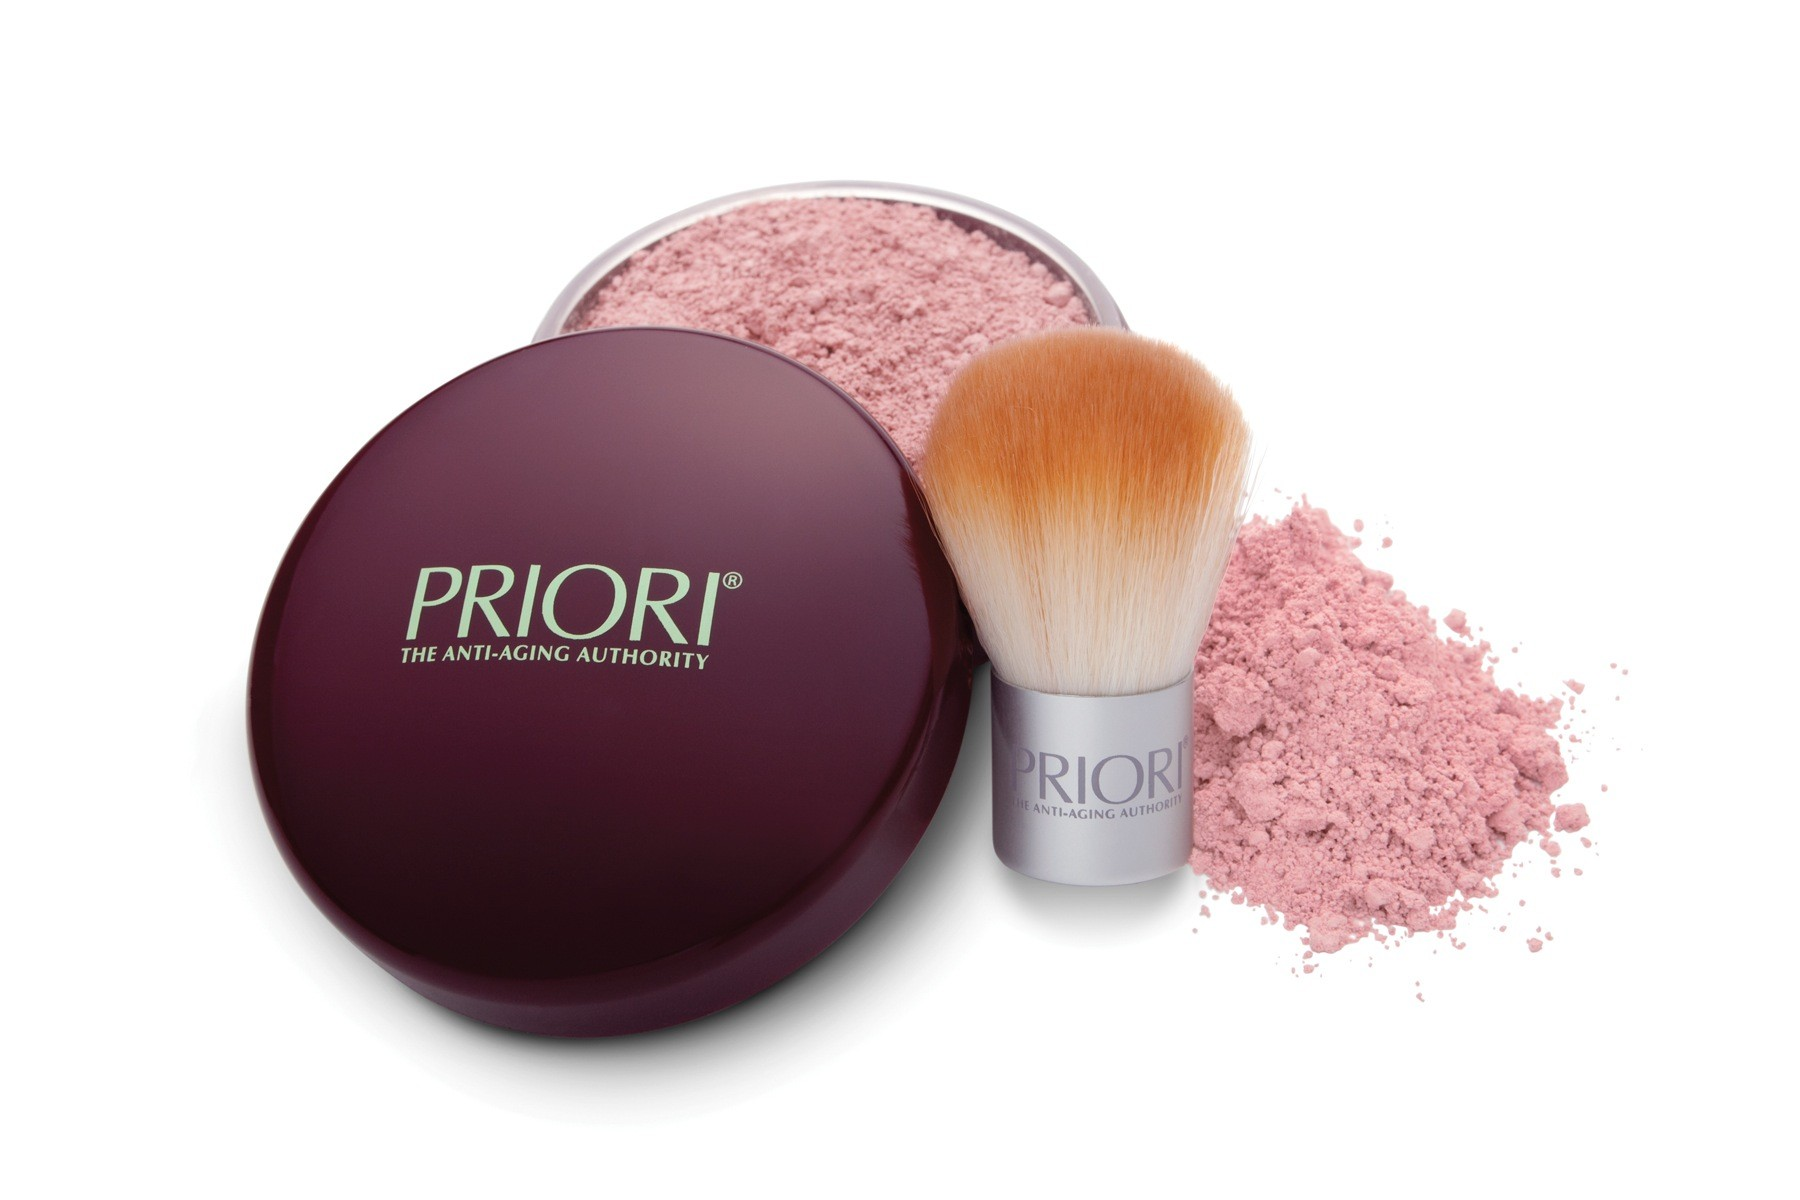 priori_coffeeberry_kabuki_and_loose_minerals